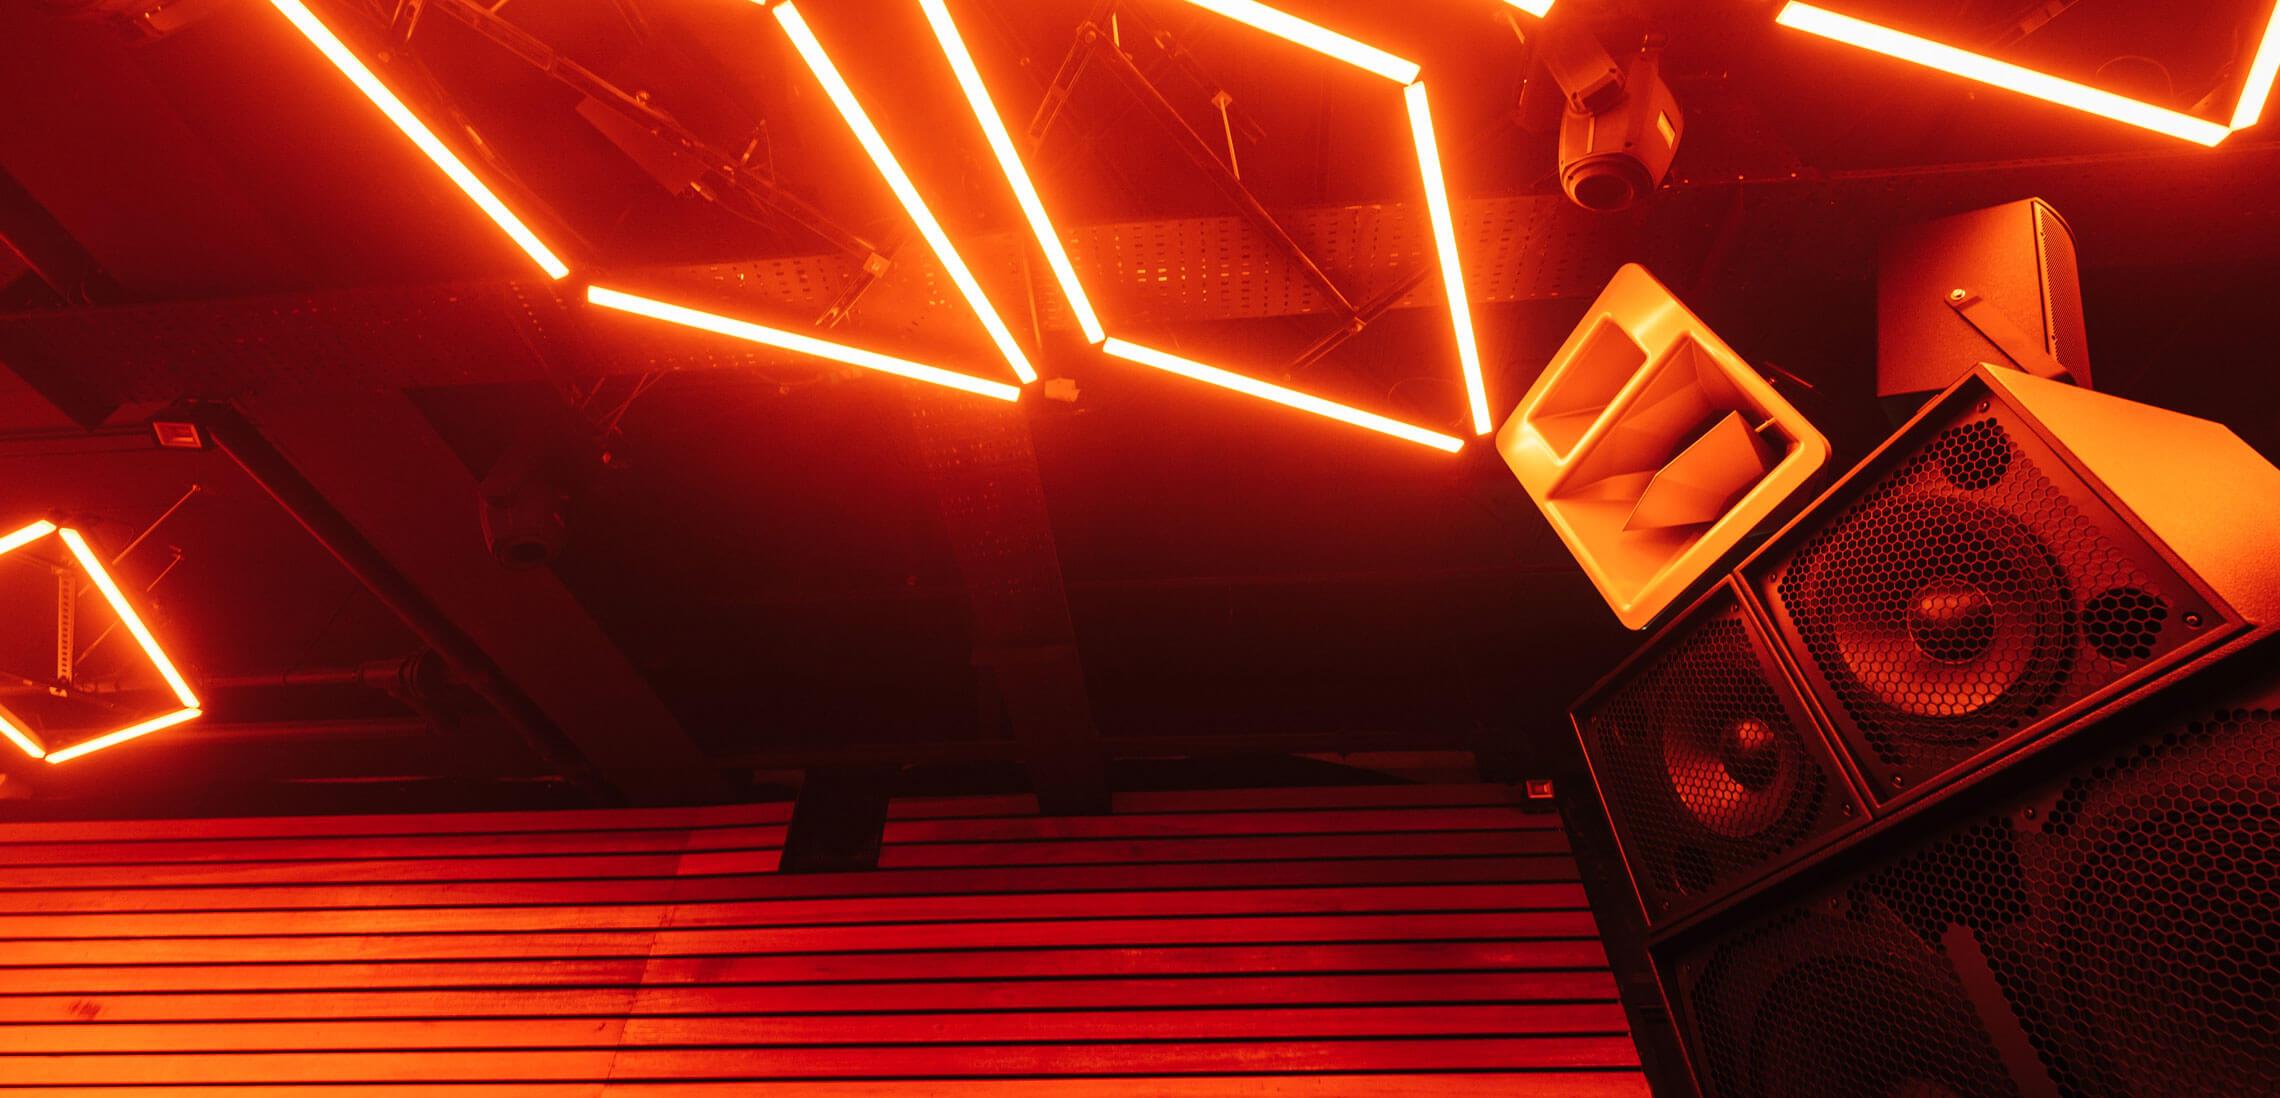 New London club Orange Yard unveils re-opening lineups w/ Chelina Manuhutu, Amine Edge & Dance, Brina Knauss and more